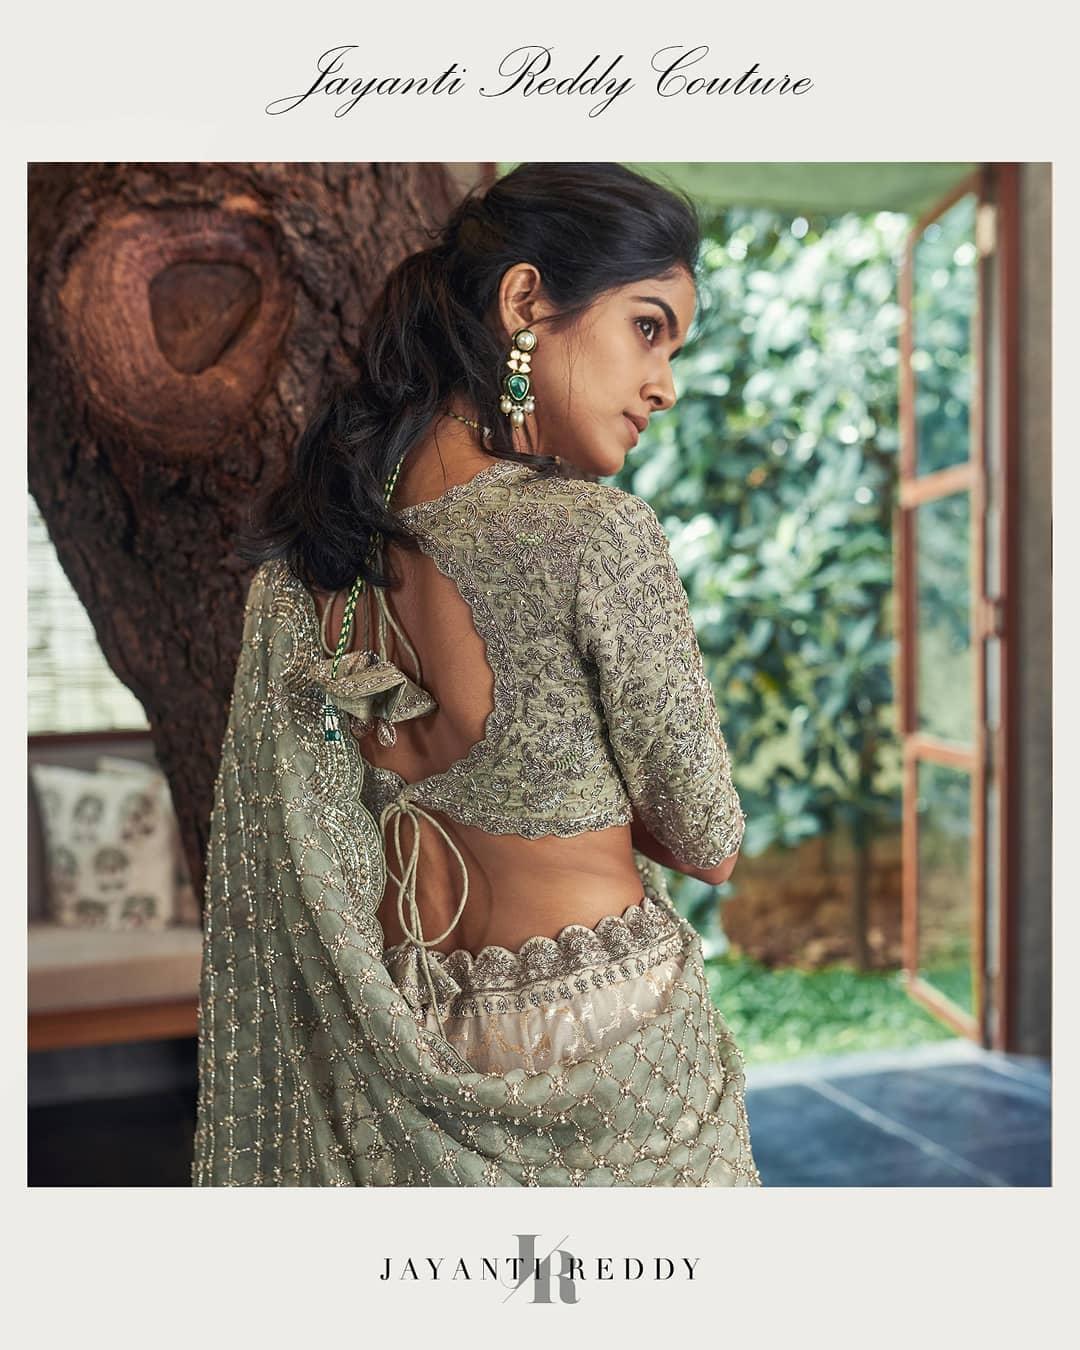 Jayanti Reddy Couture lehenga and blouse  WhatsApp  on +91 91214 32255 or DM  for more details.  Photographer : Akshay rao.  Model: Drishikachander. Jewellery: Krsala jewellery. 2020-09-05